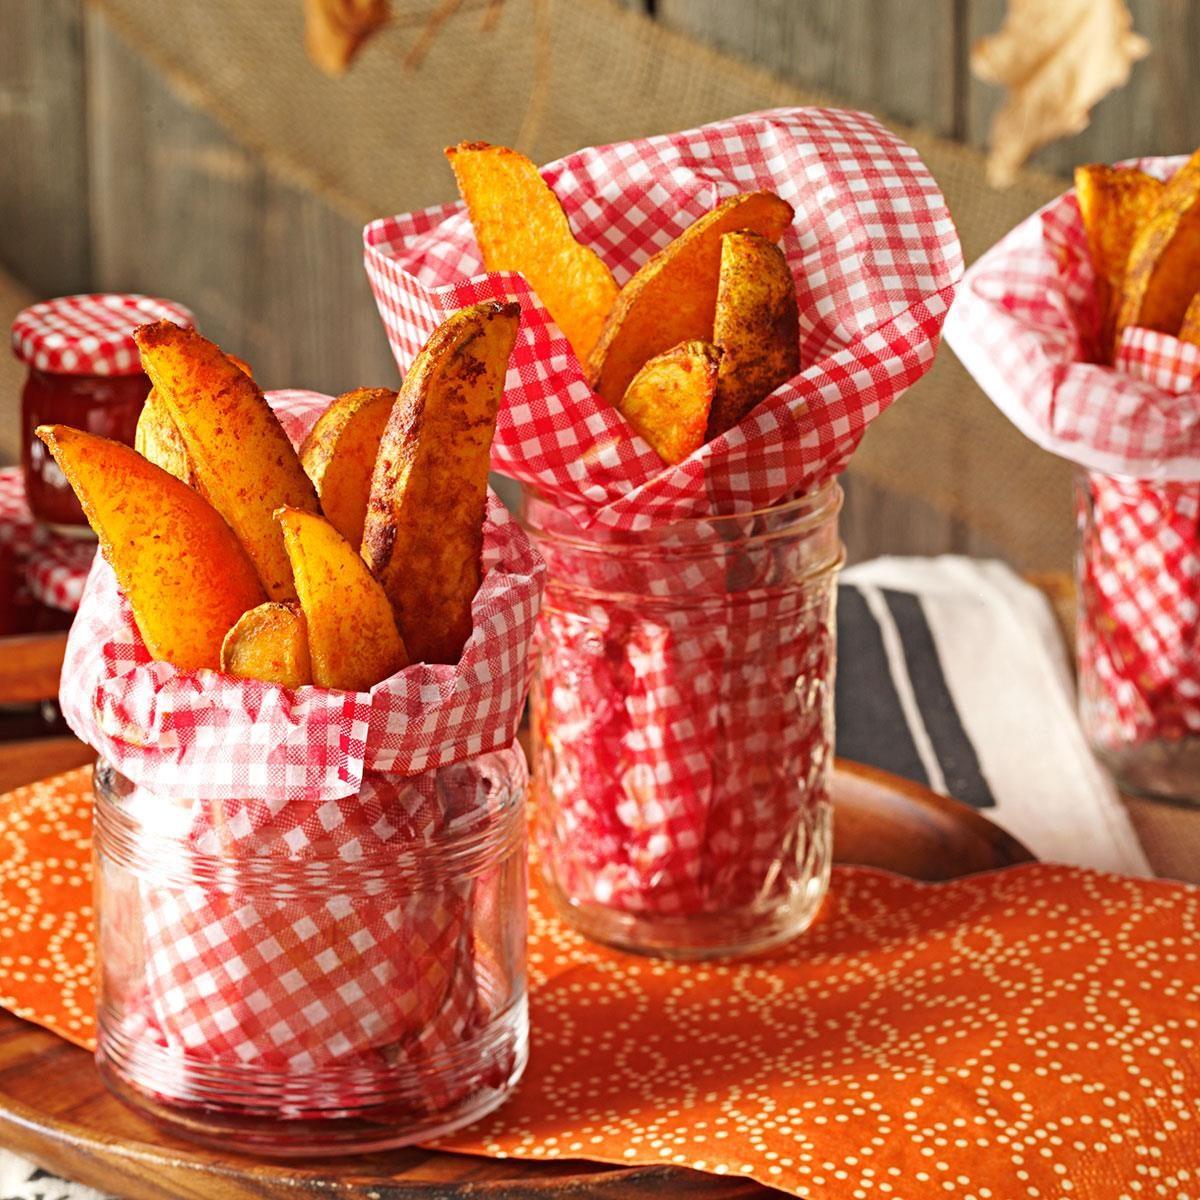 Pennsylvania: Oven Fries